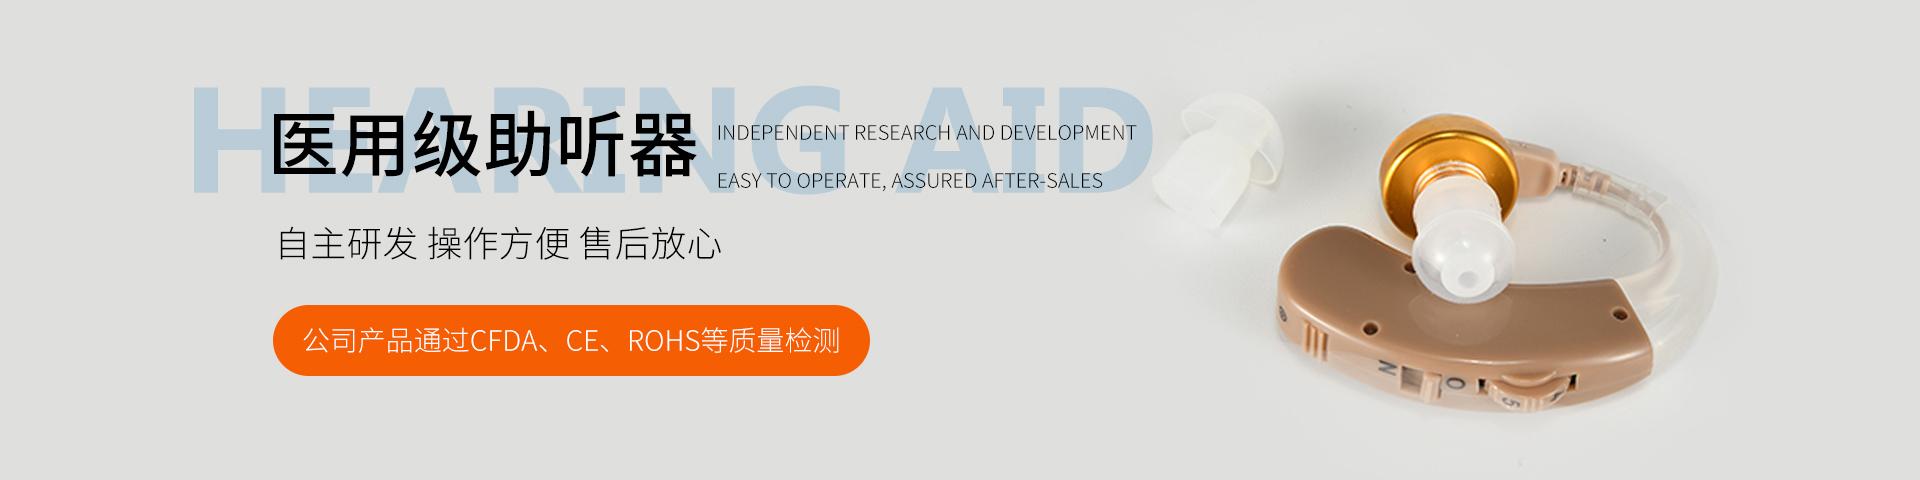 http://www.jieyuda18.com/data/upload/202104/20210412140846_746.jpg